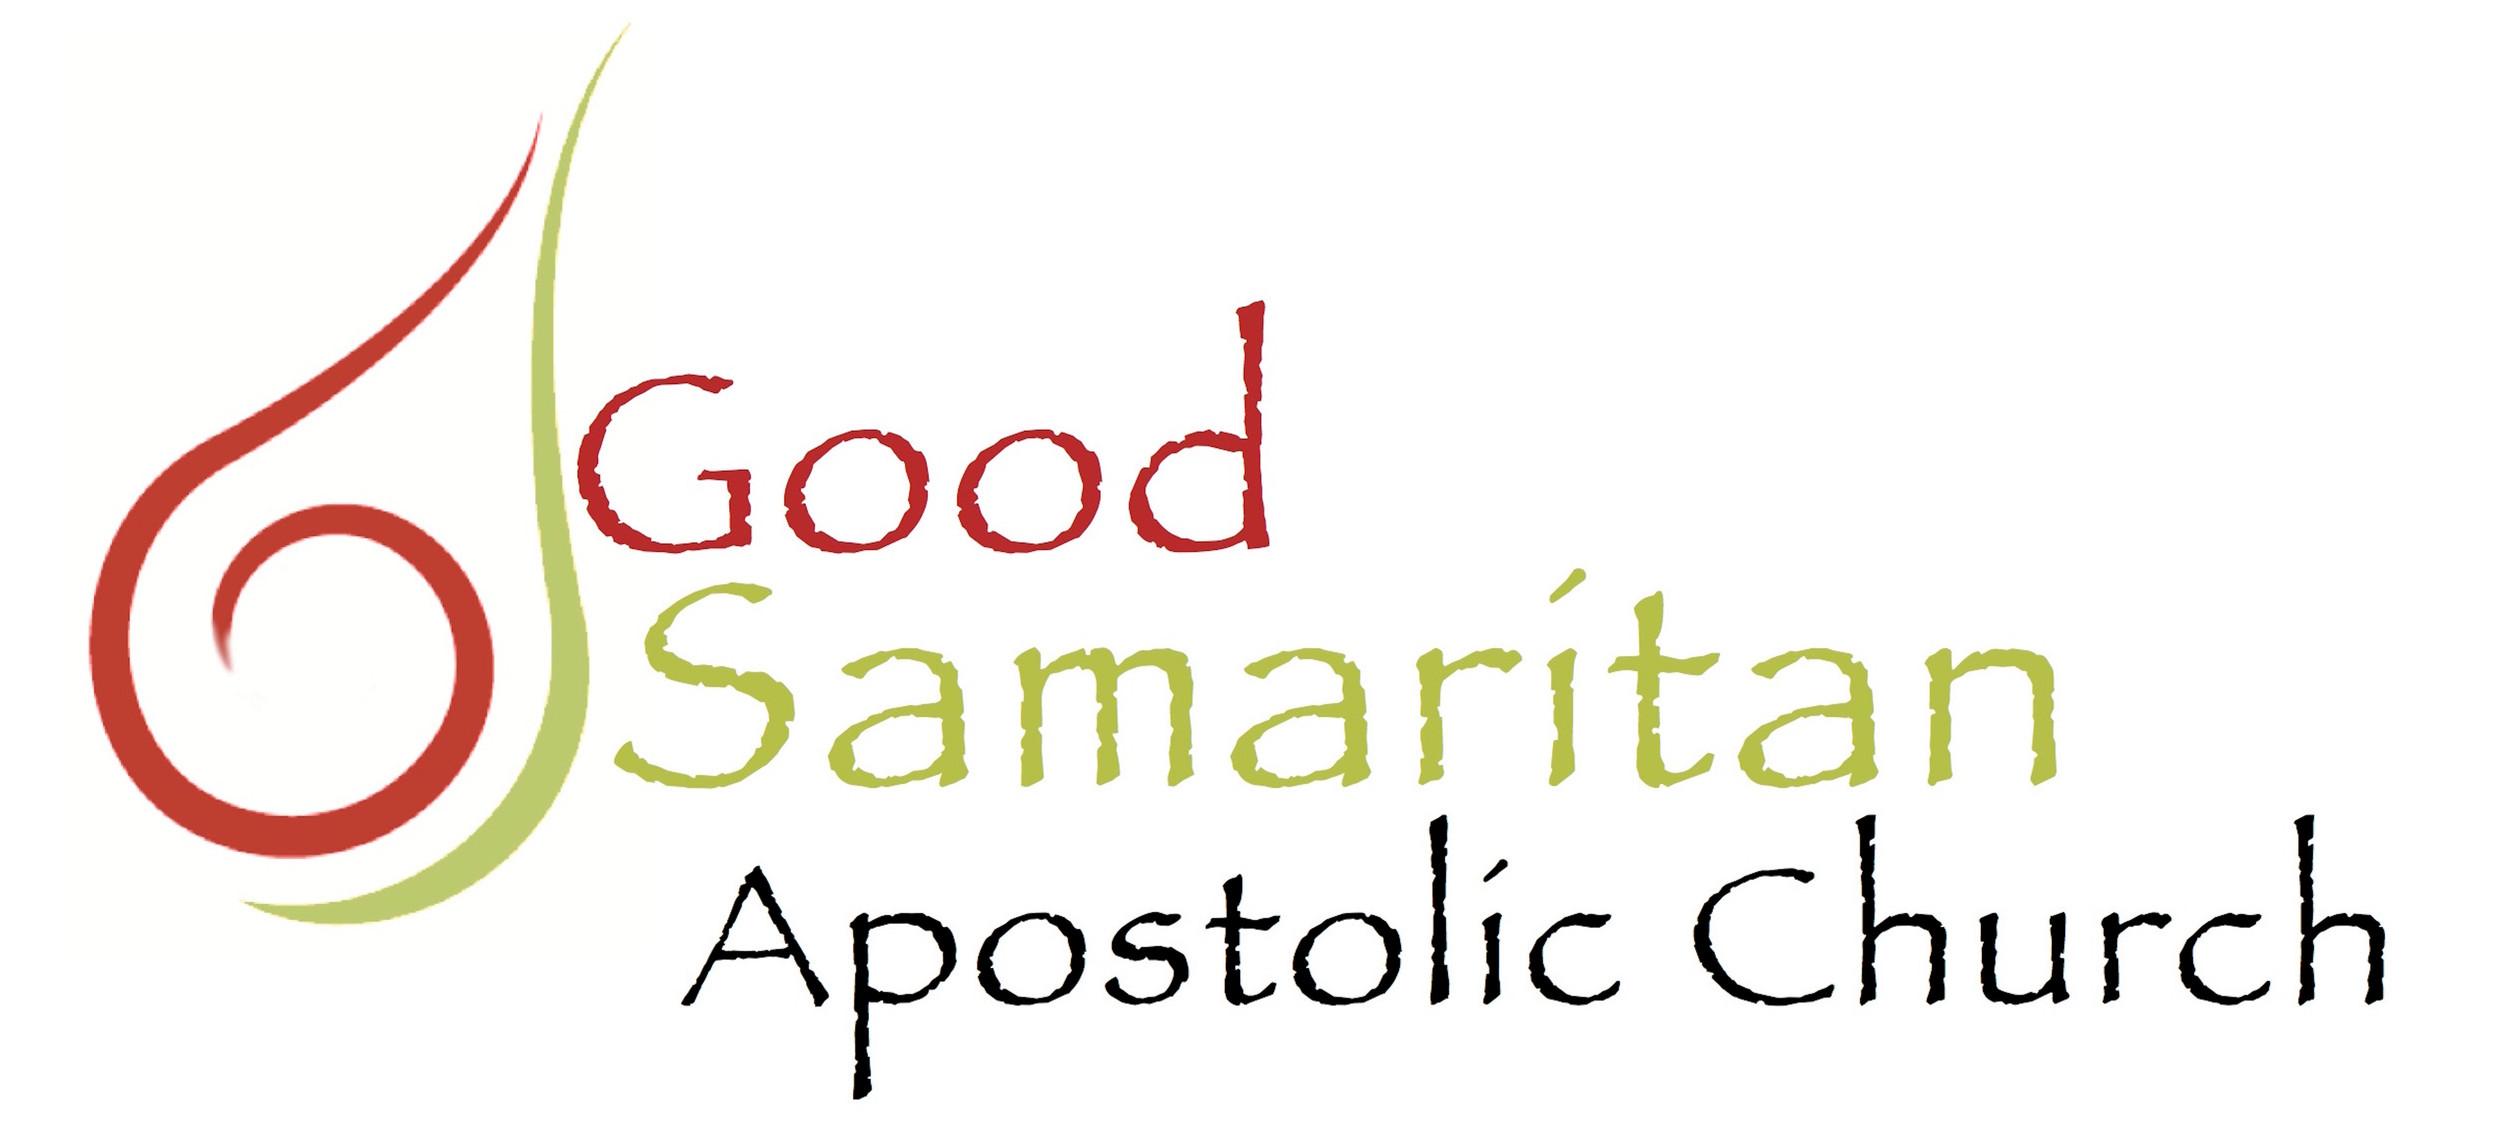 about | Good Samaritan Apostolic Church, is a Wittenberg